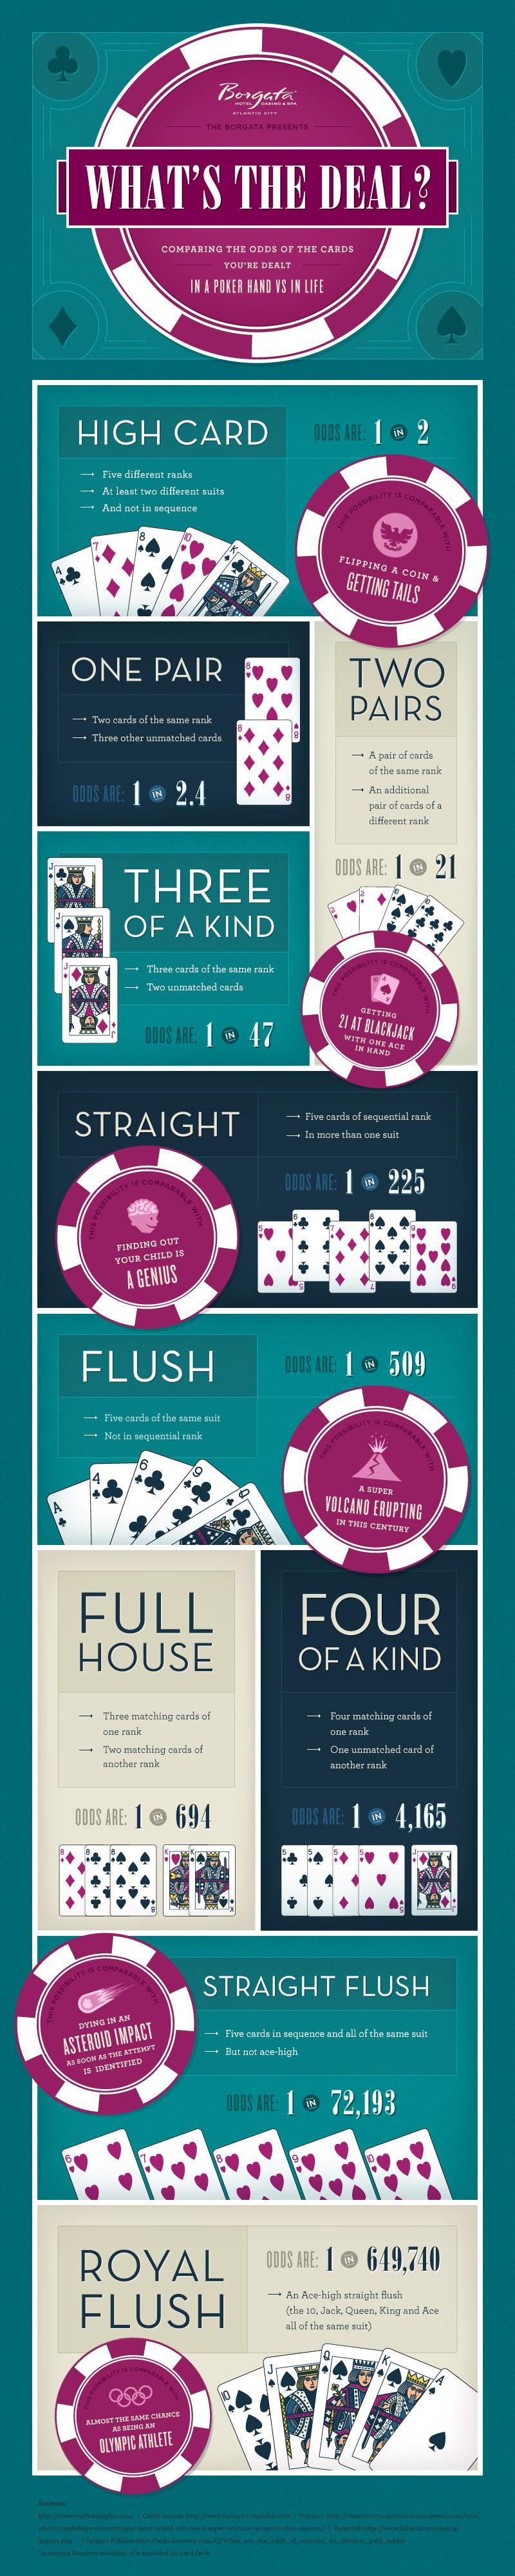 life-cards-dealt